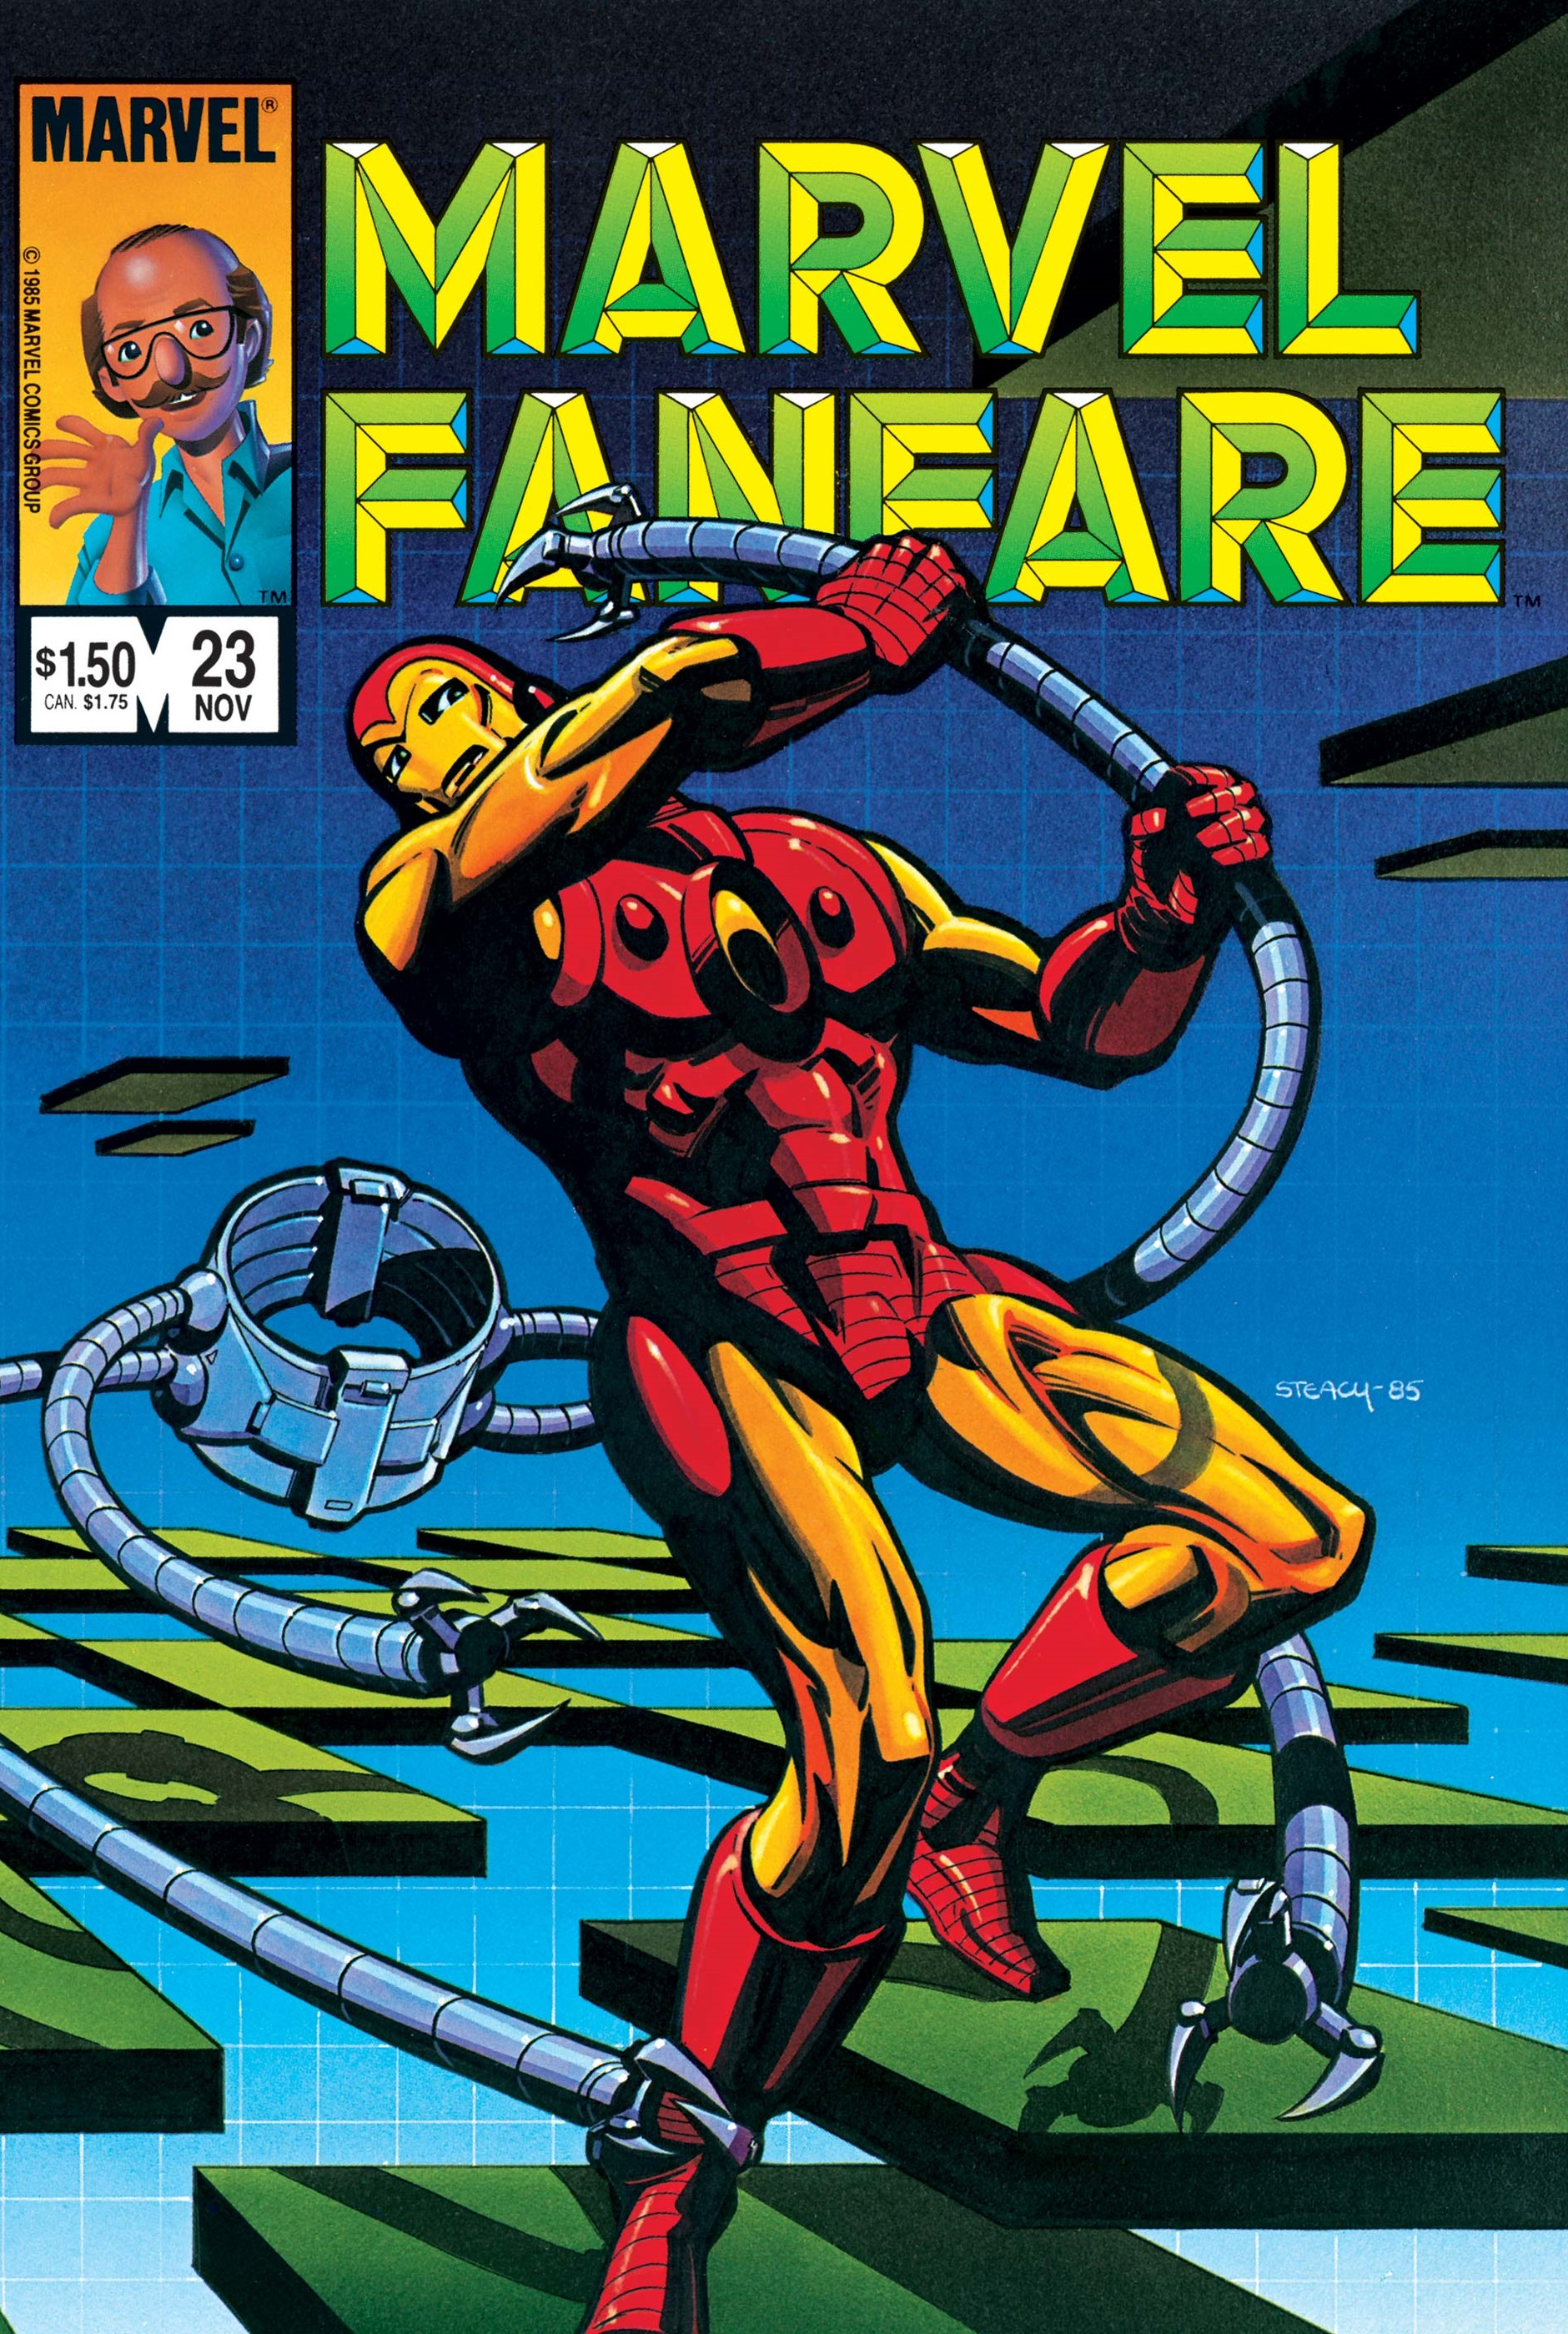 Marvel Fanfare (1982) #23